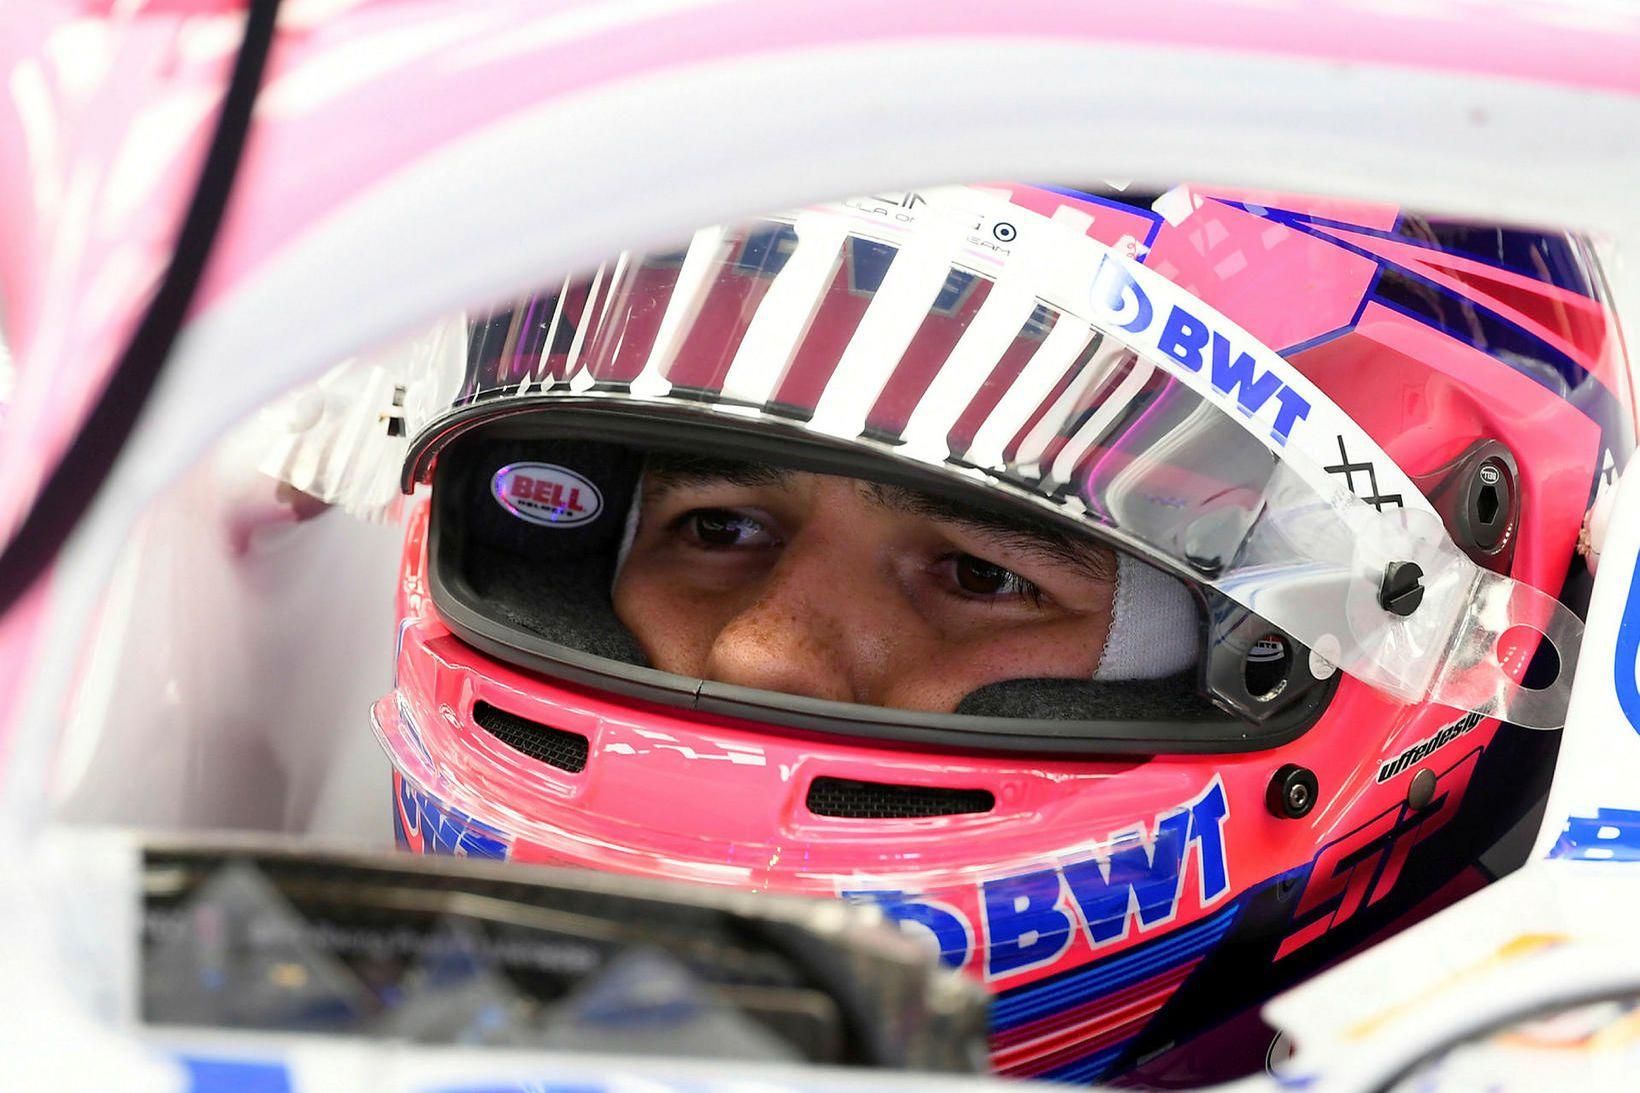 Sergio Perez missir af breska kappakstrinum í Silverstone þar sem …